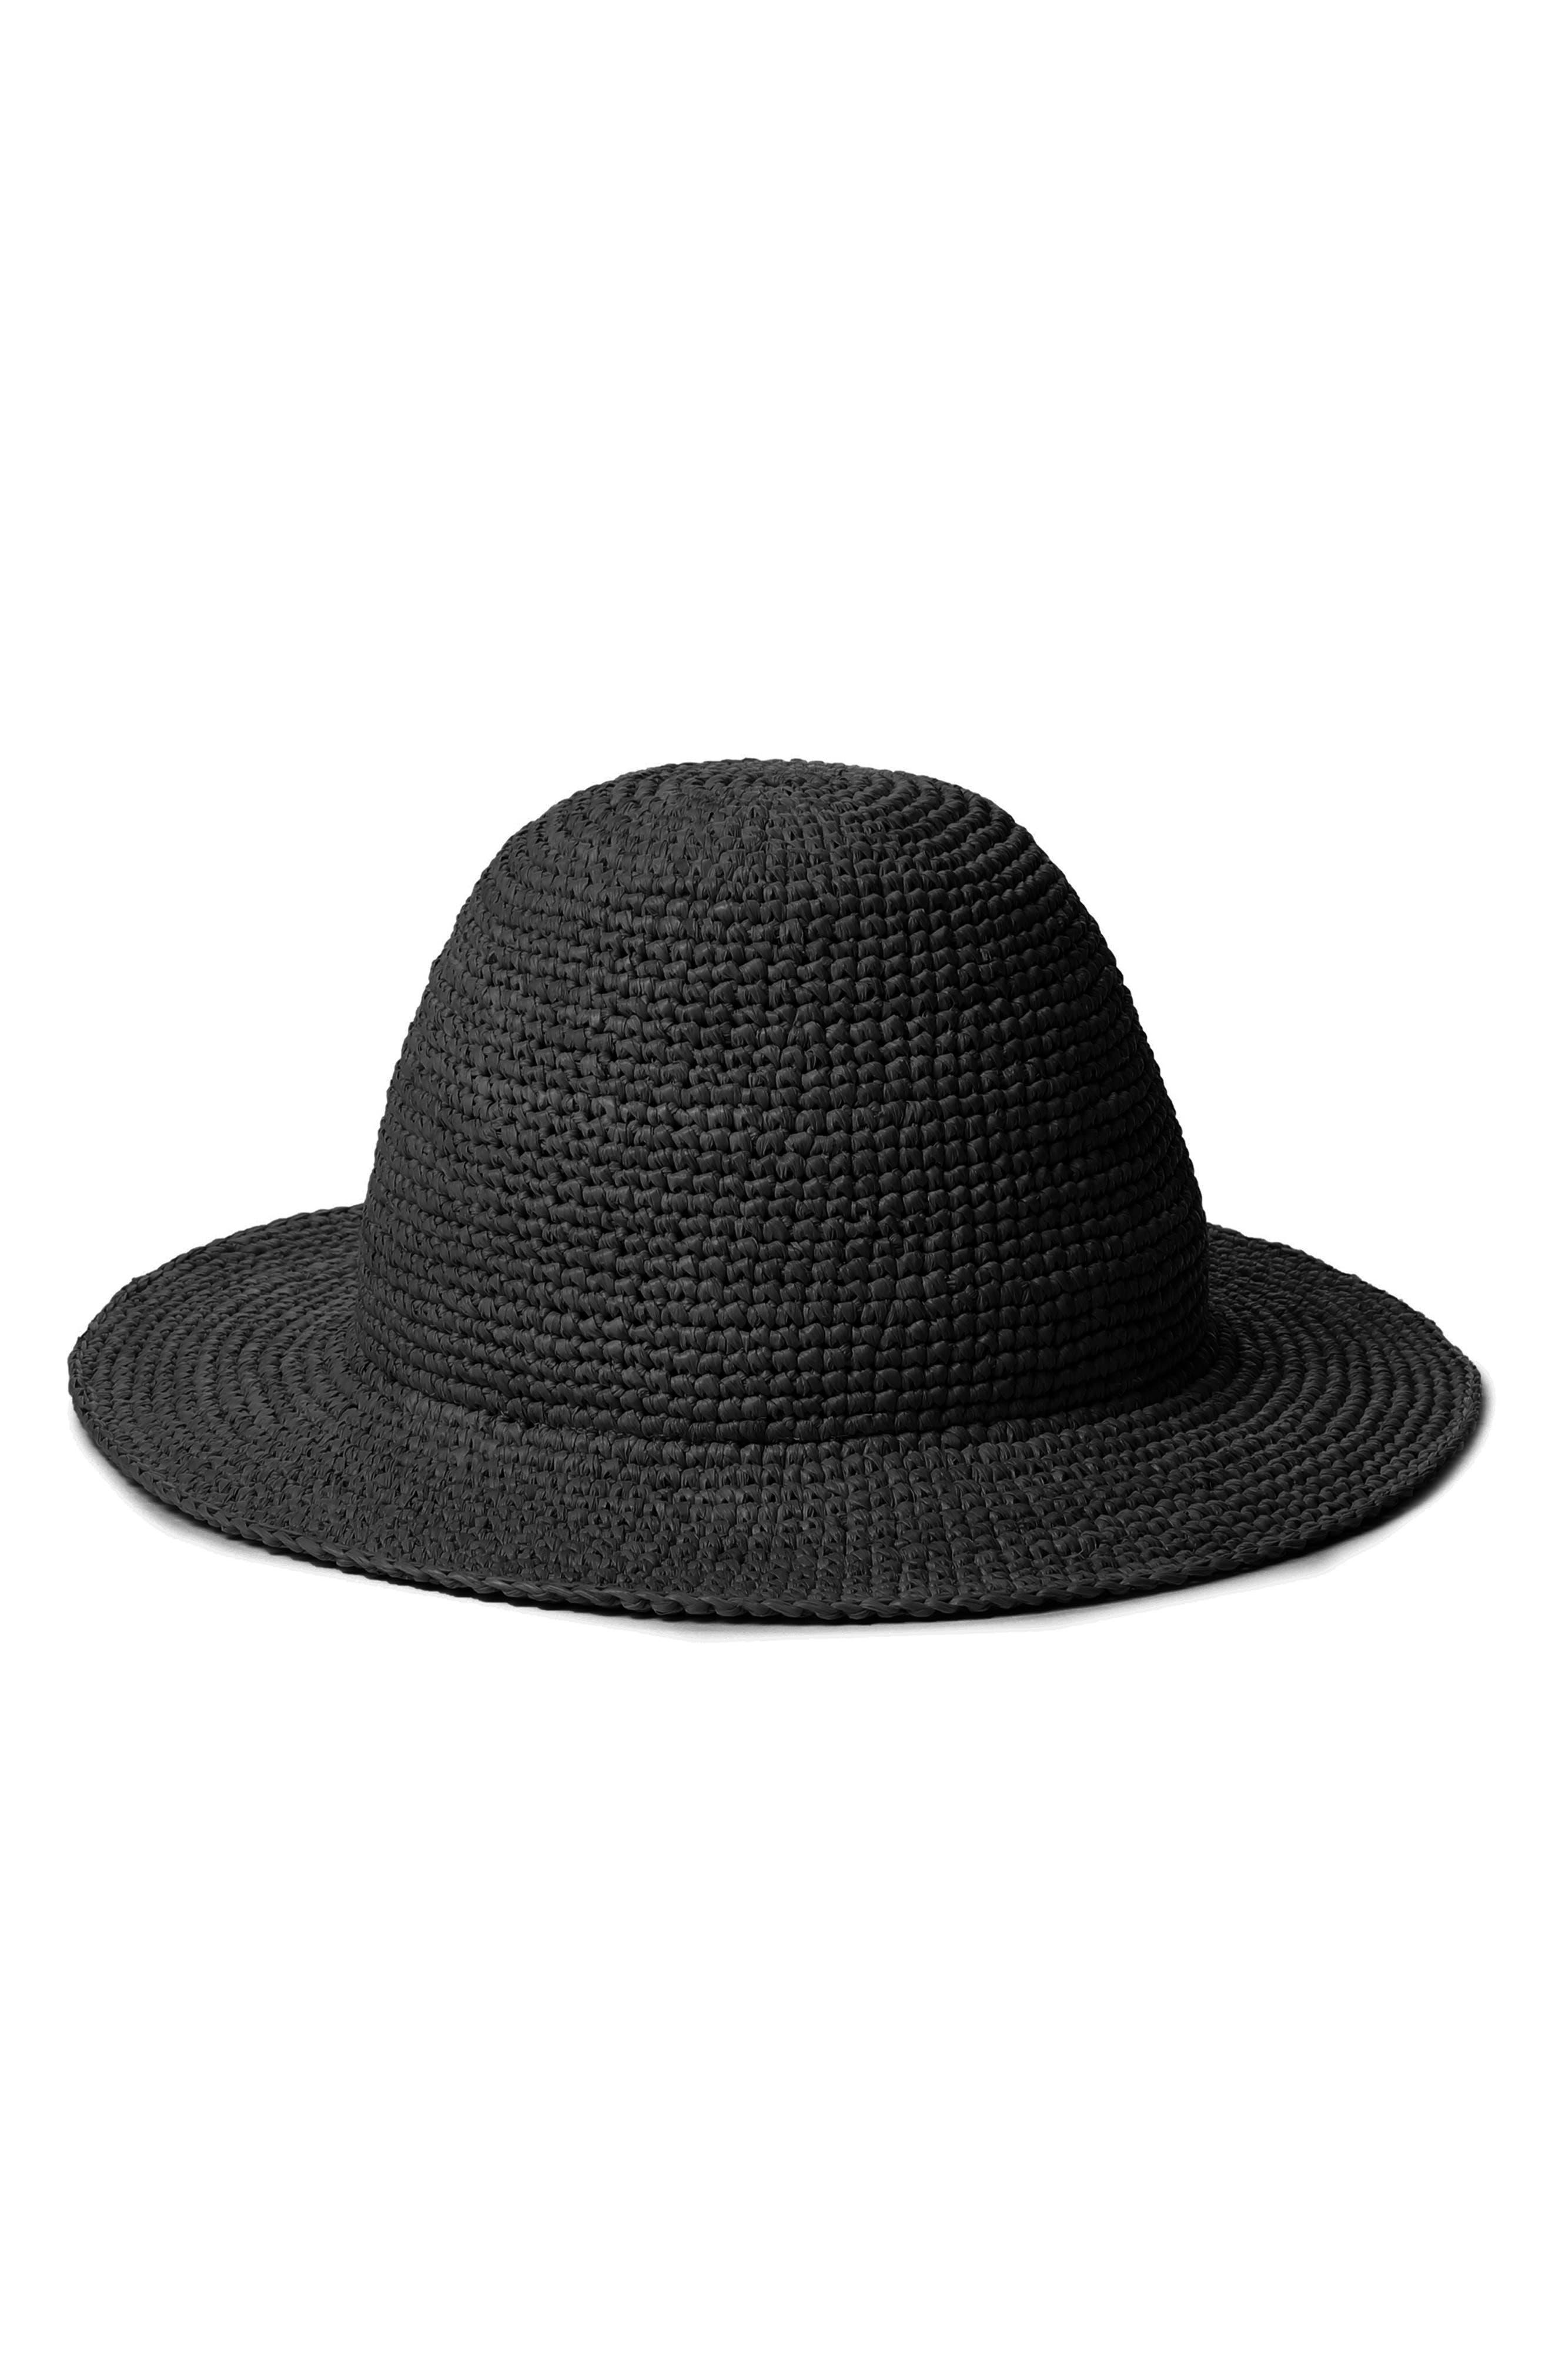 Quinn Straw Bucket Hat